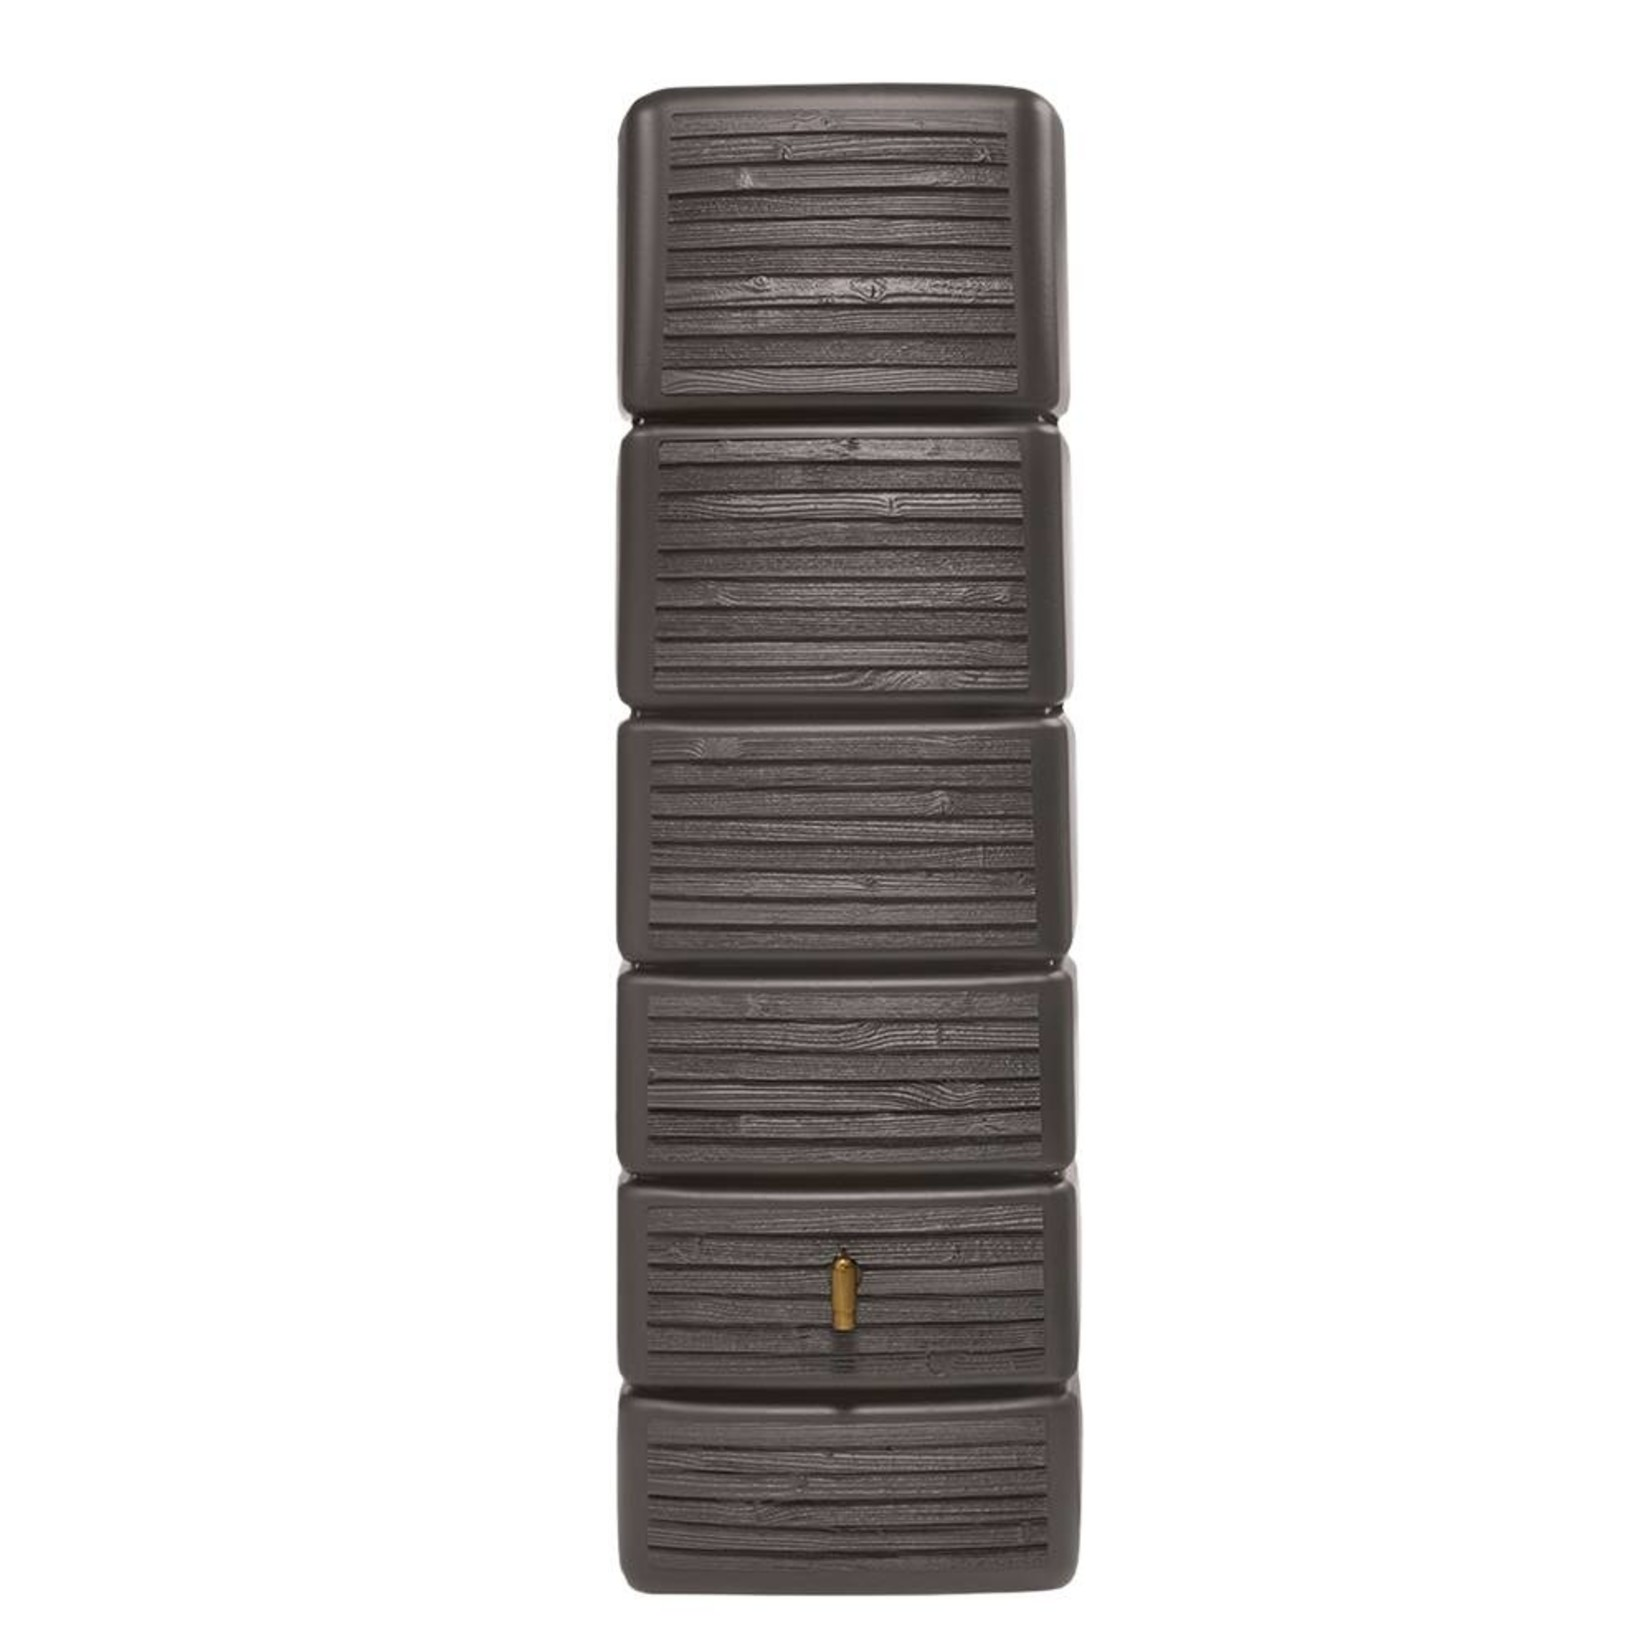 Garantia SLIM wandtank 300 ltr wood decor dark